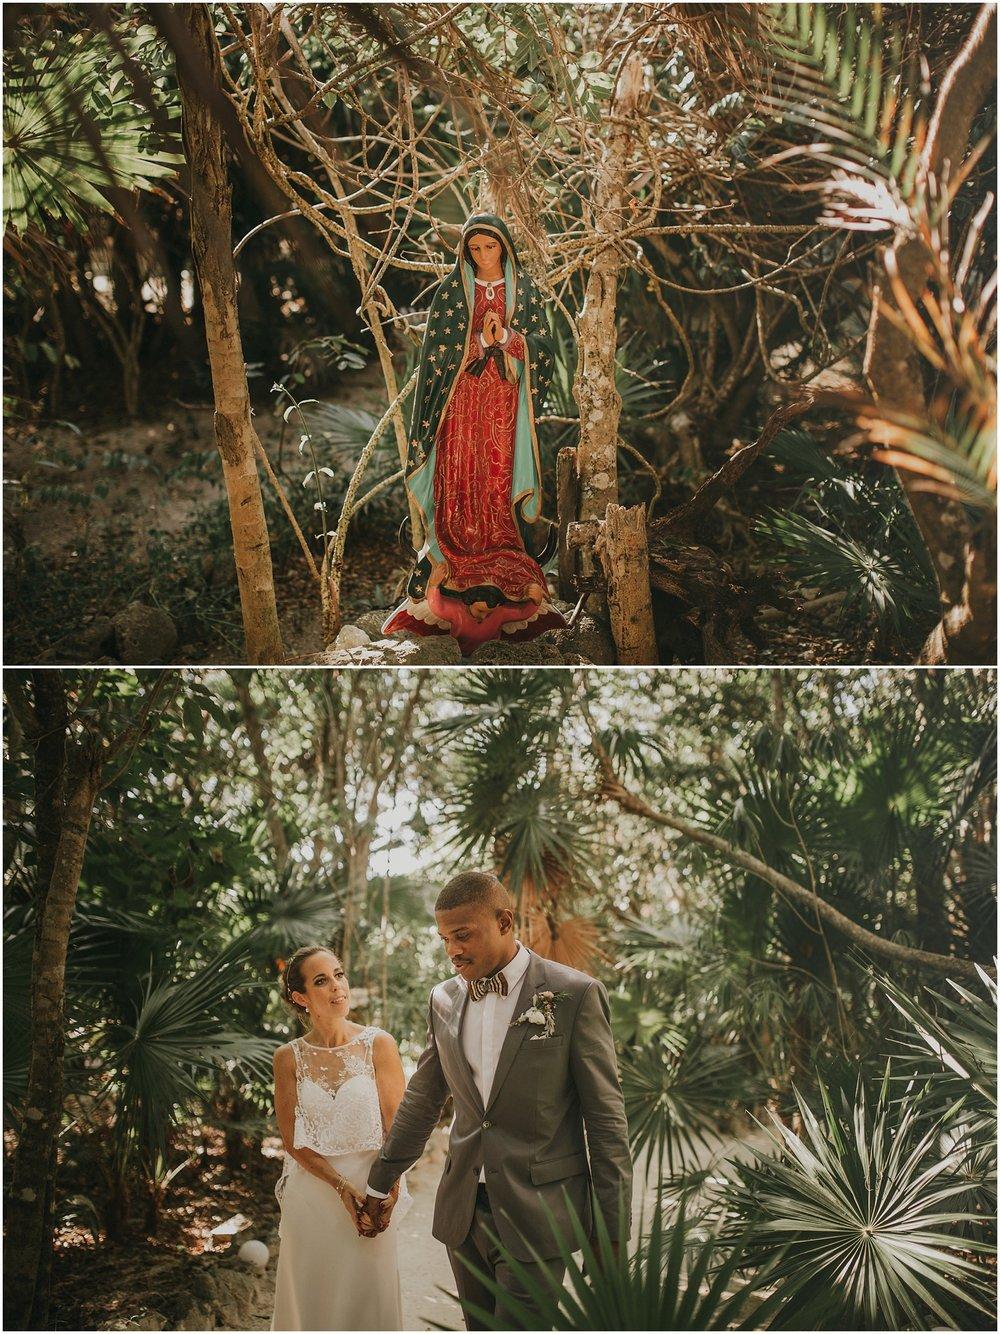 Pablo Laguia wedding photographer 083.jpg